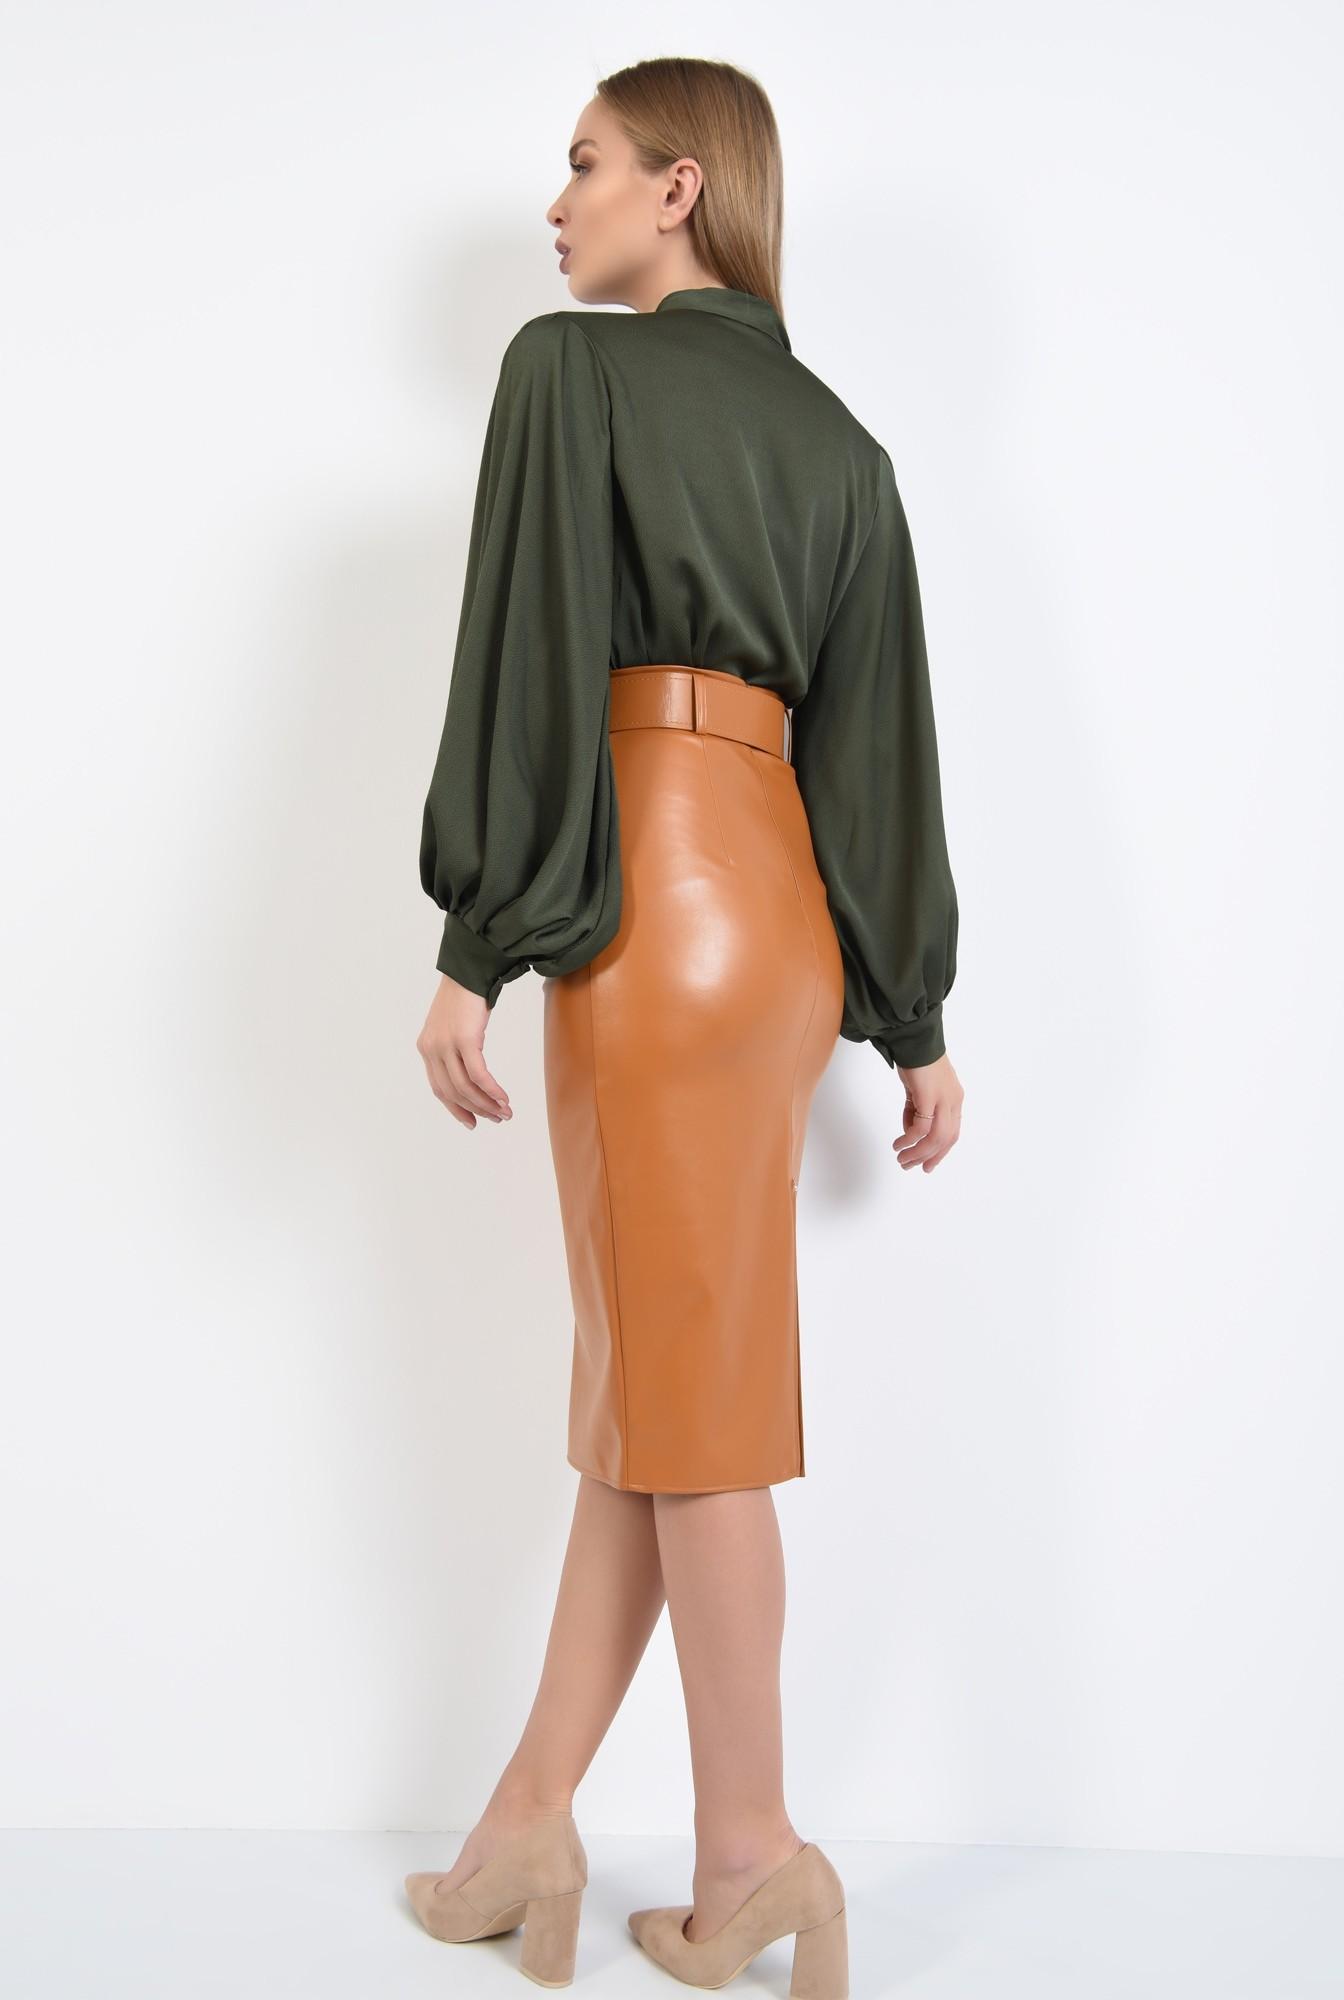 1 - 360 - bluza cu maneci bufante, funda la guler, verde kaki, tesatura fluida